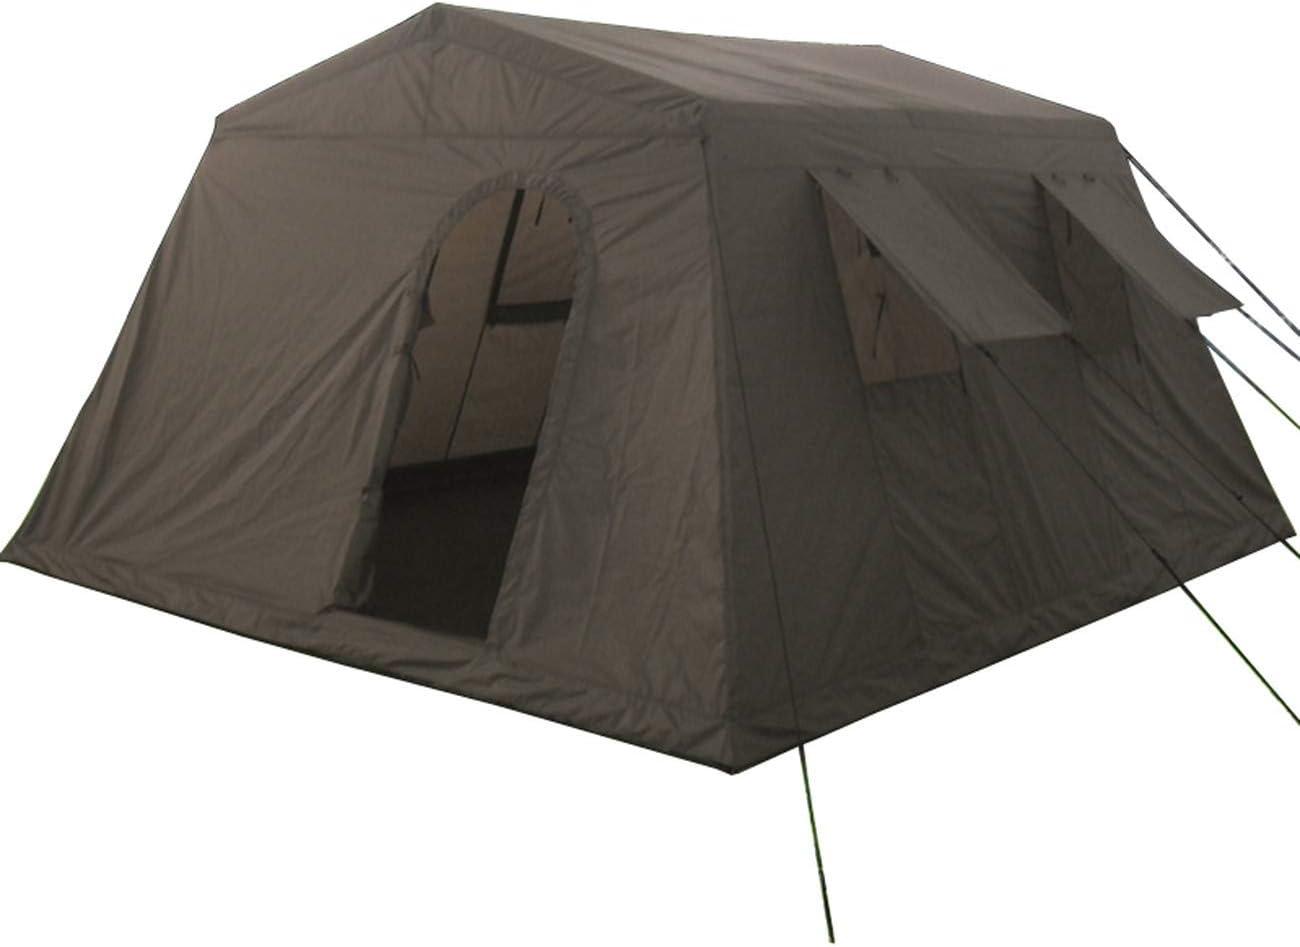 6-Mann Zelt Camping Military    -NEU Armeezelt woodland Outdoor